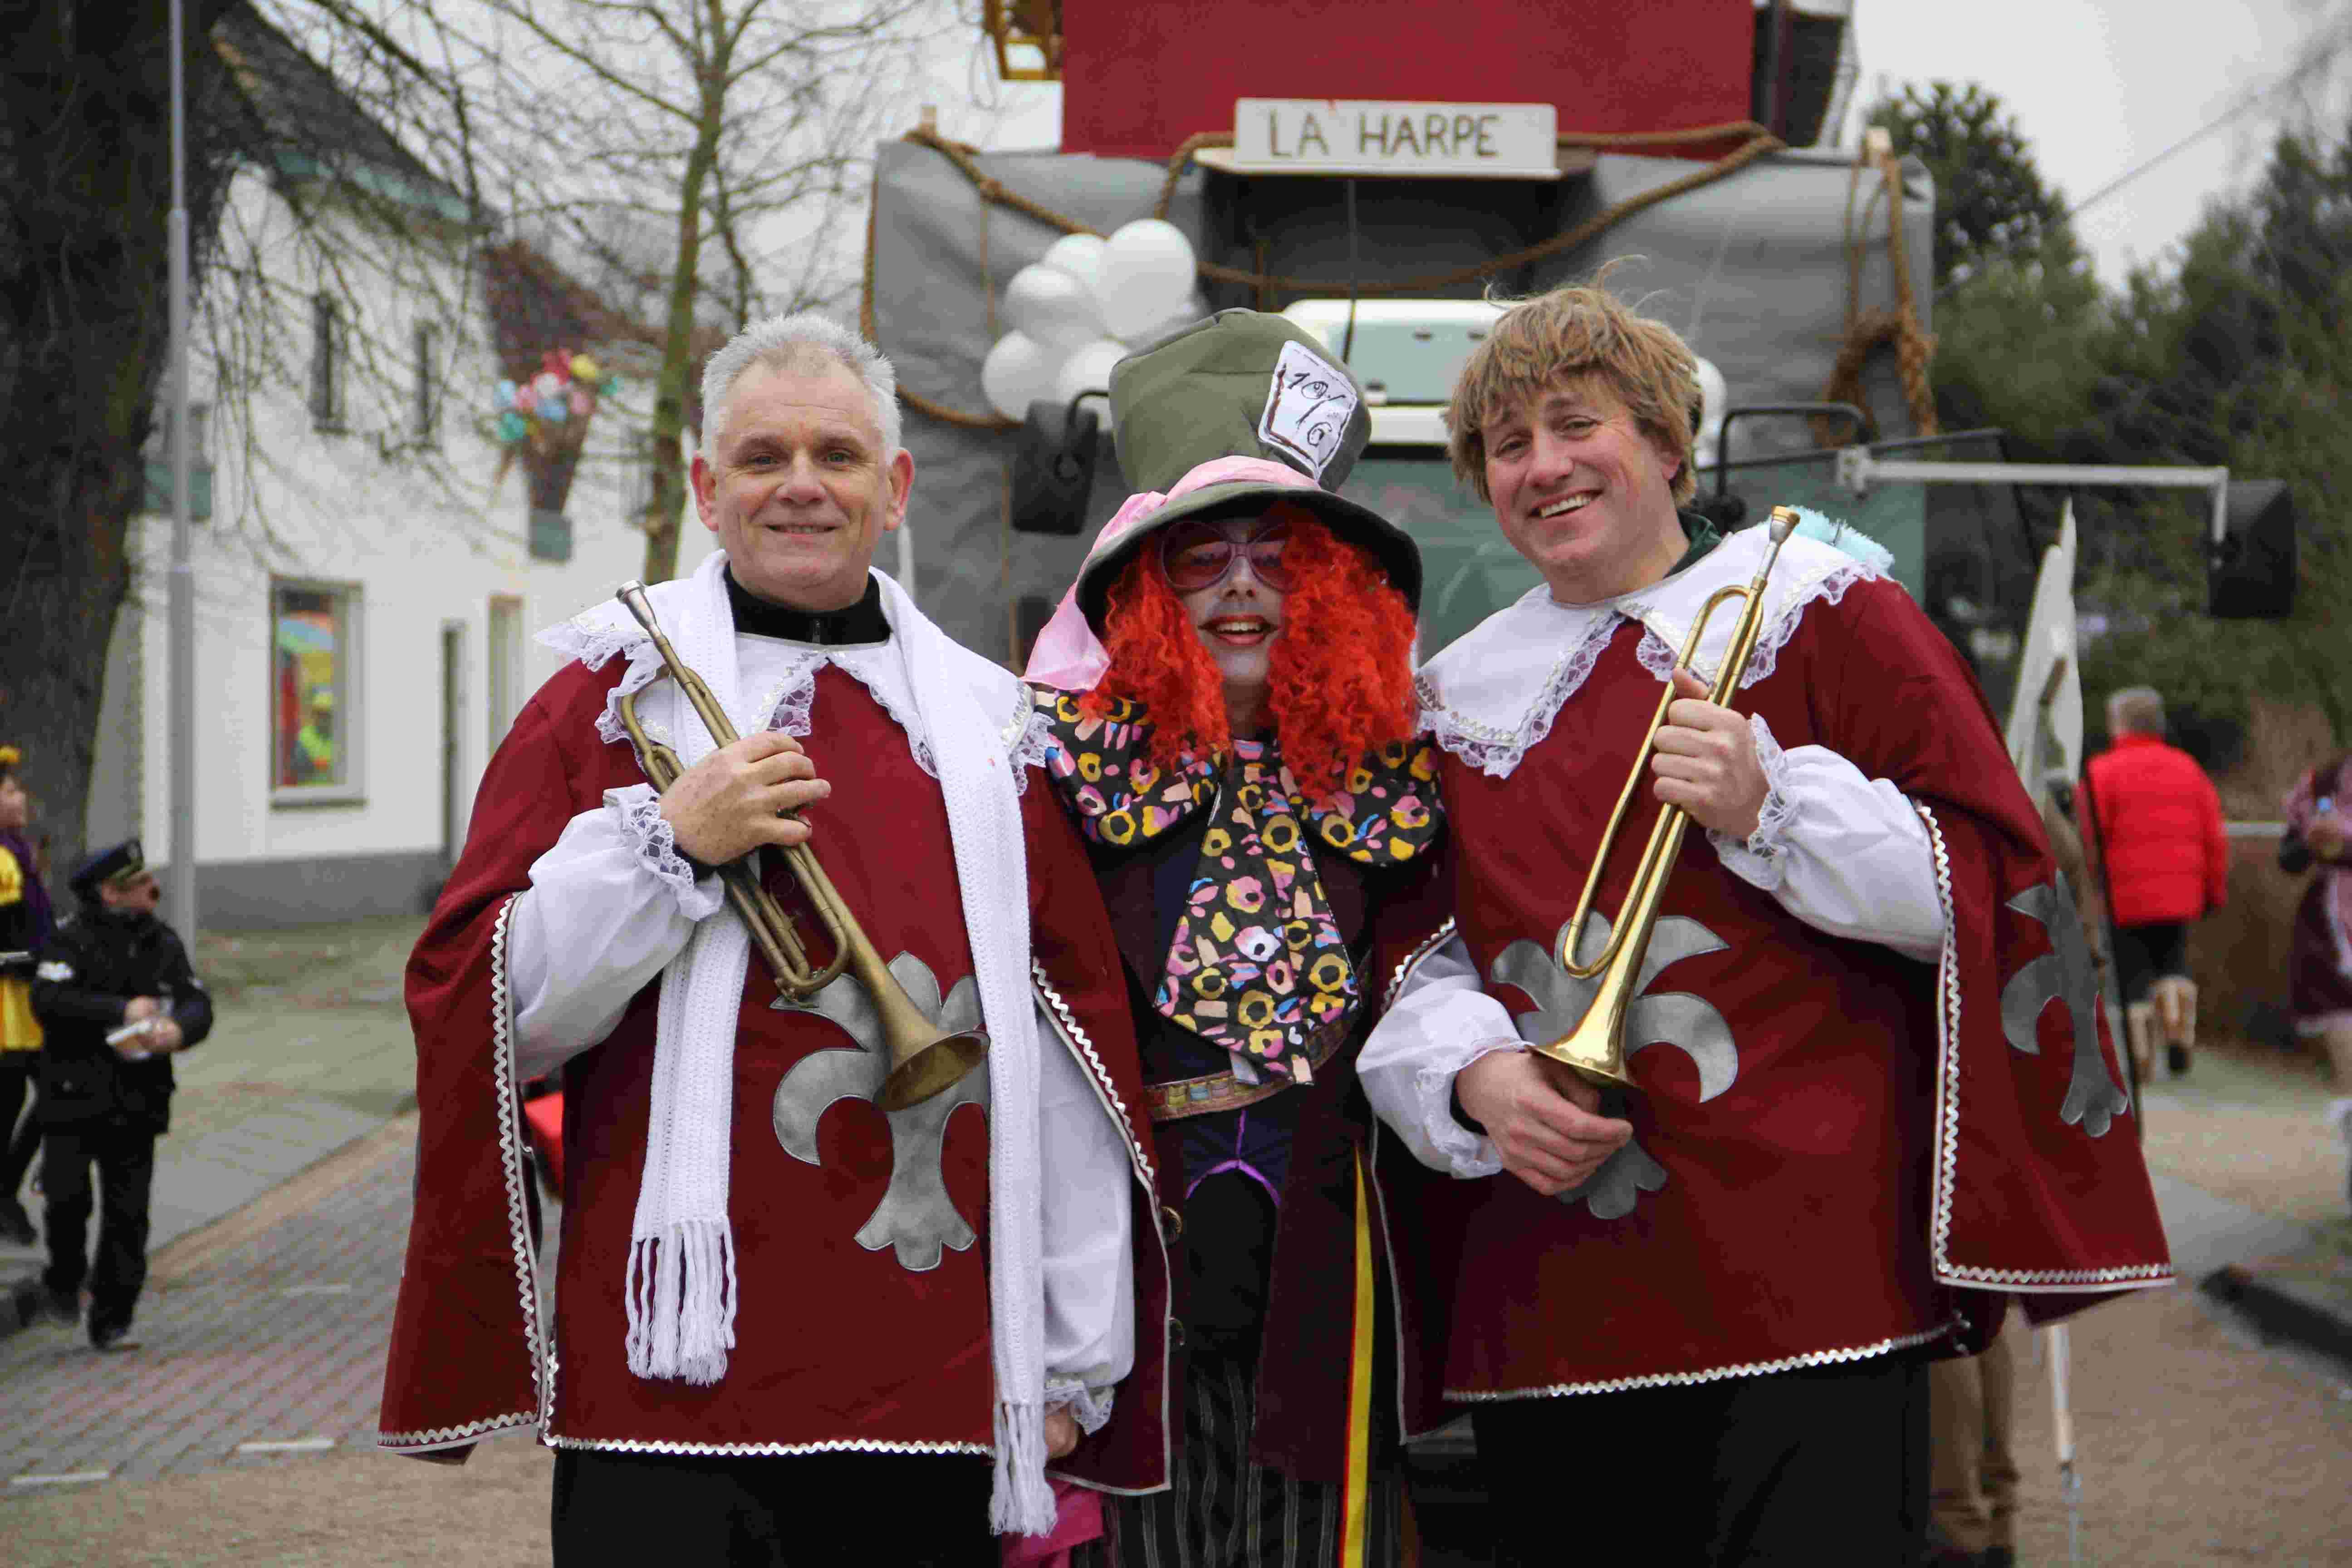 Carnaval fanfare La Harpe